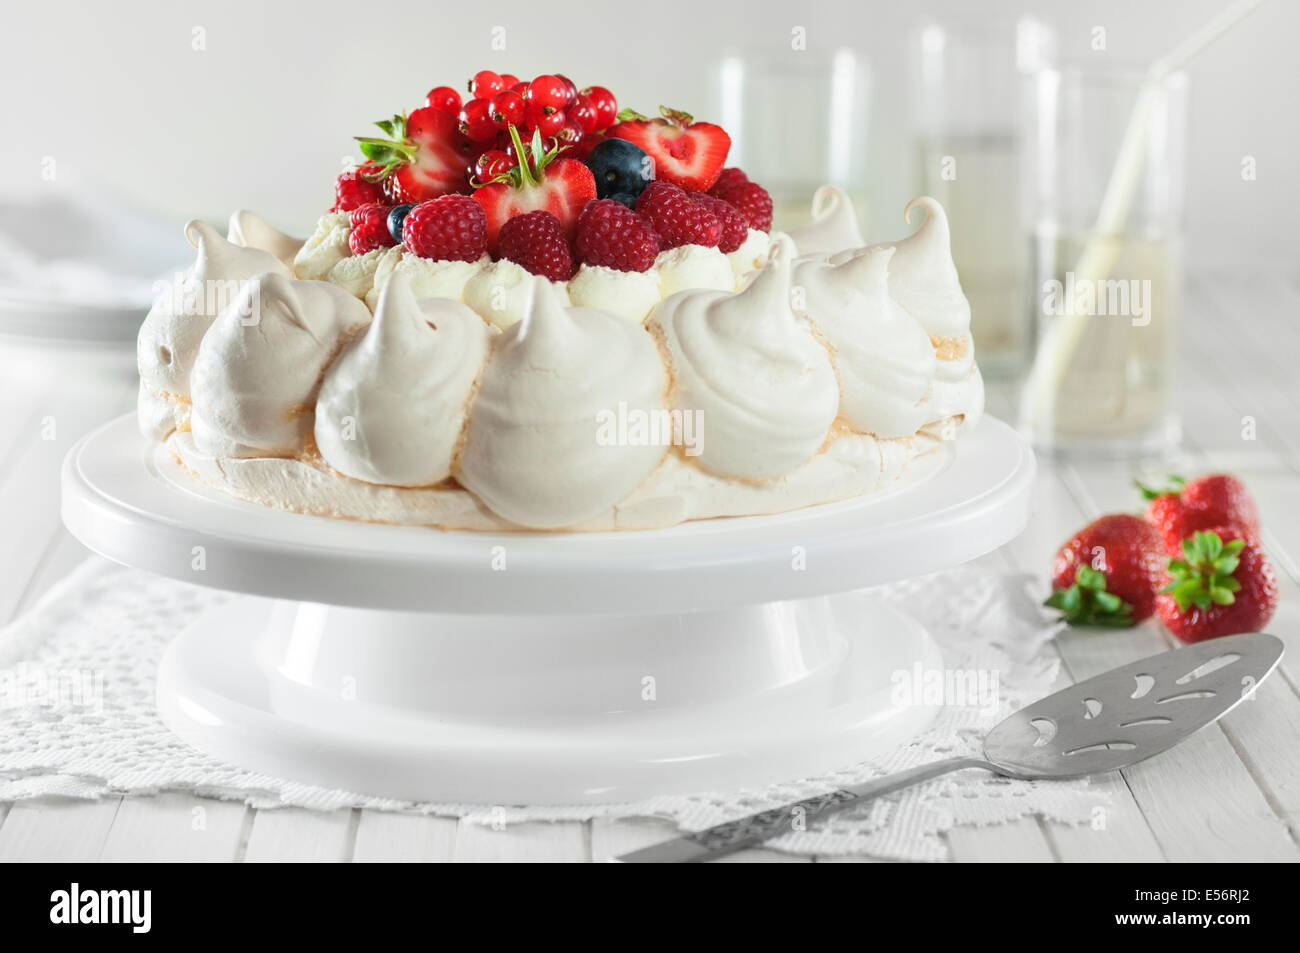 Summer fruit pavlova. Meringue and cream dessert - Stock Image